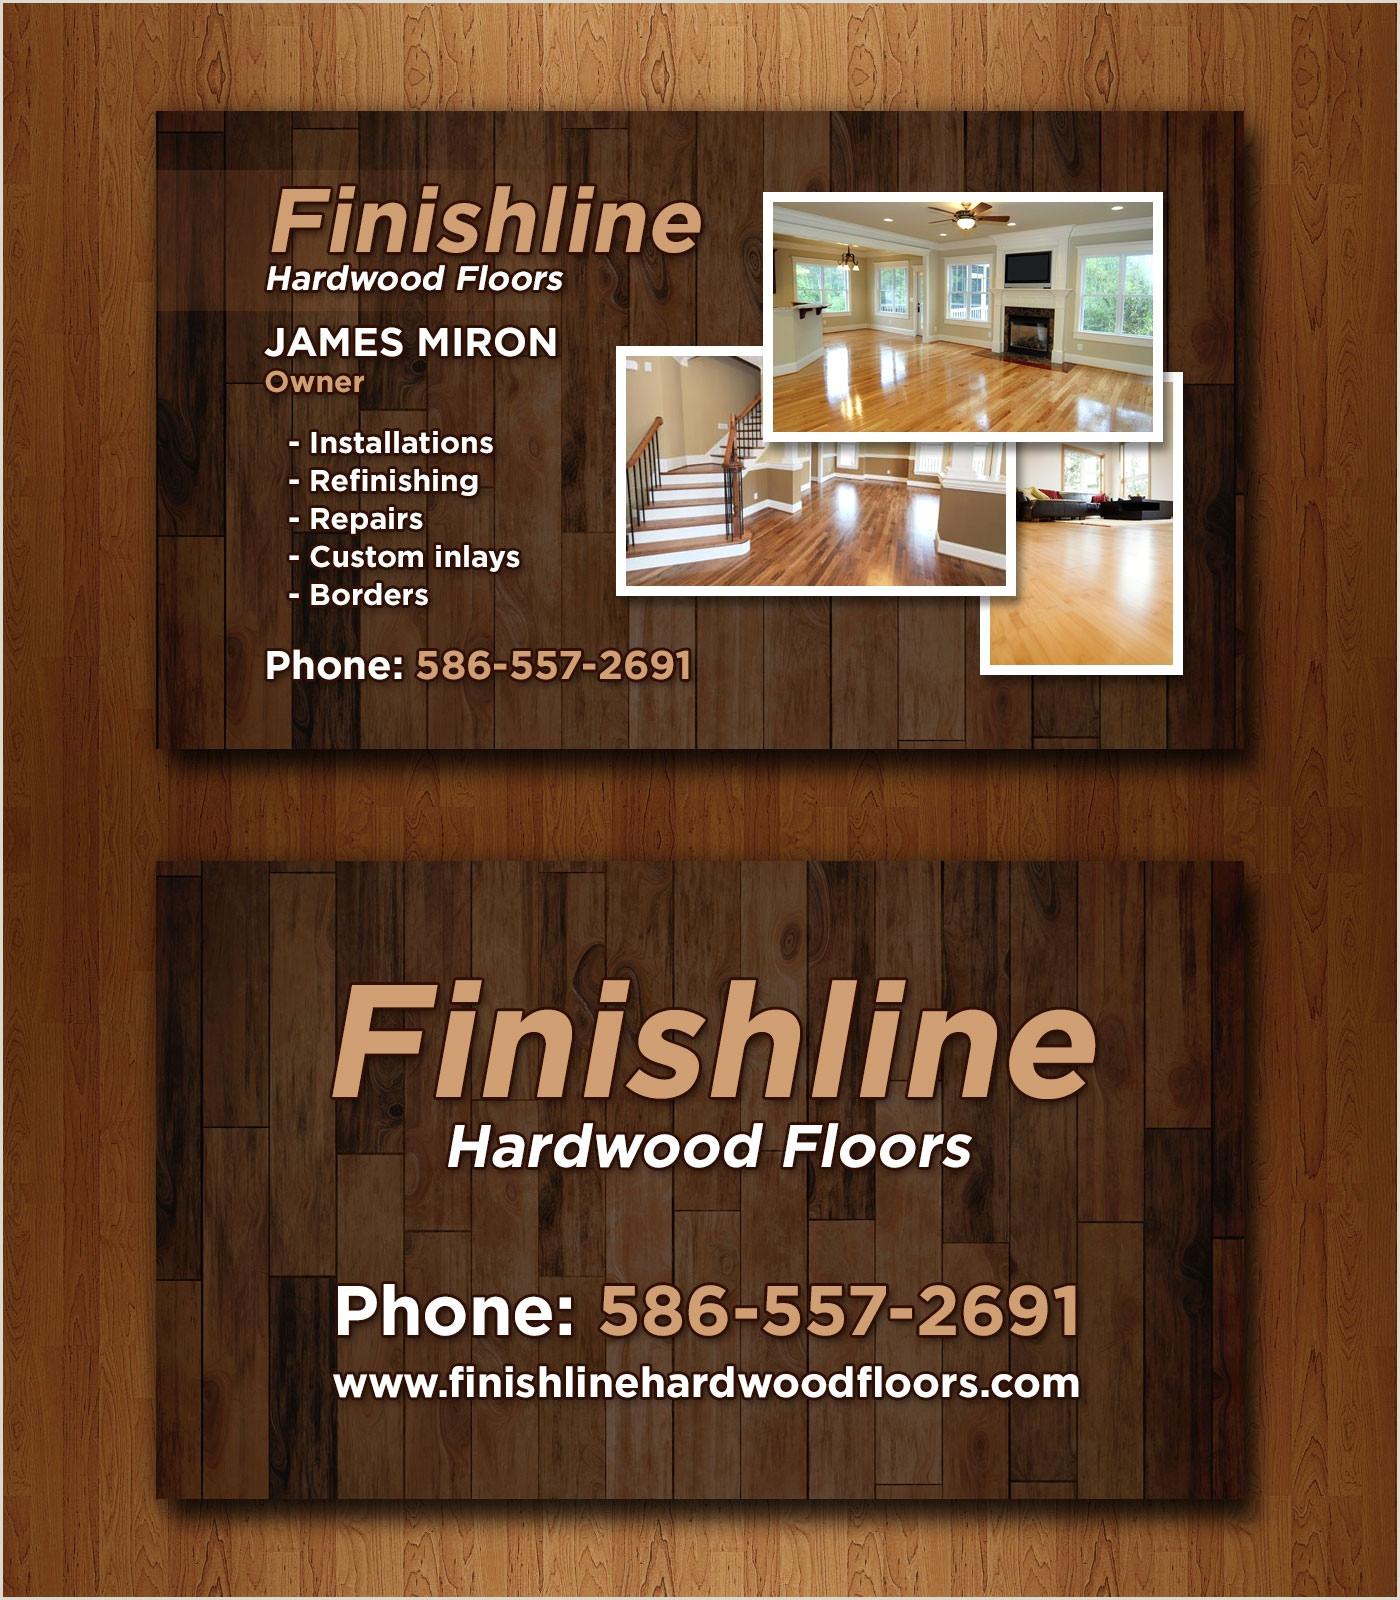 Sample Event Planner Business Cards 14 Popular Hardwood Flooring Business Card Template